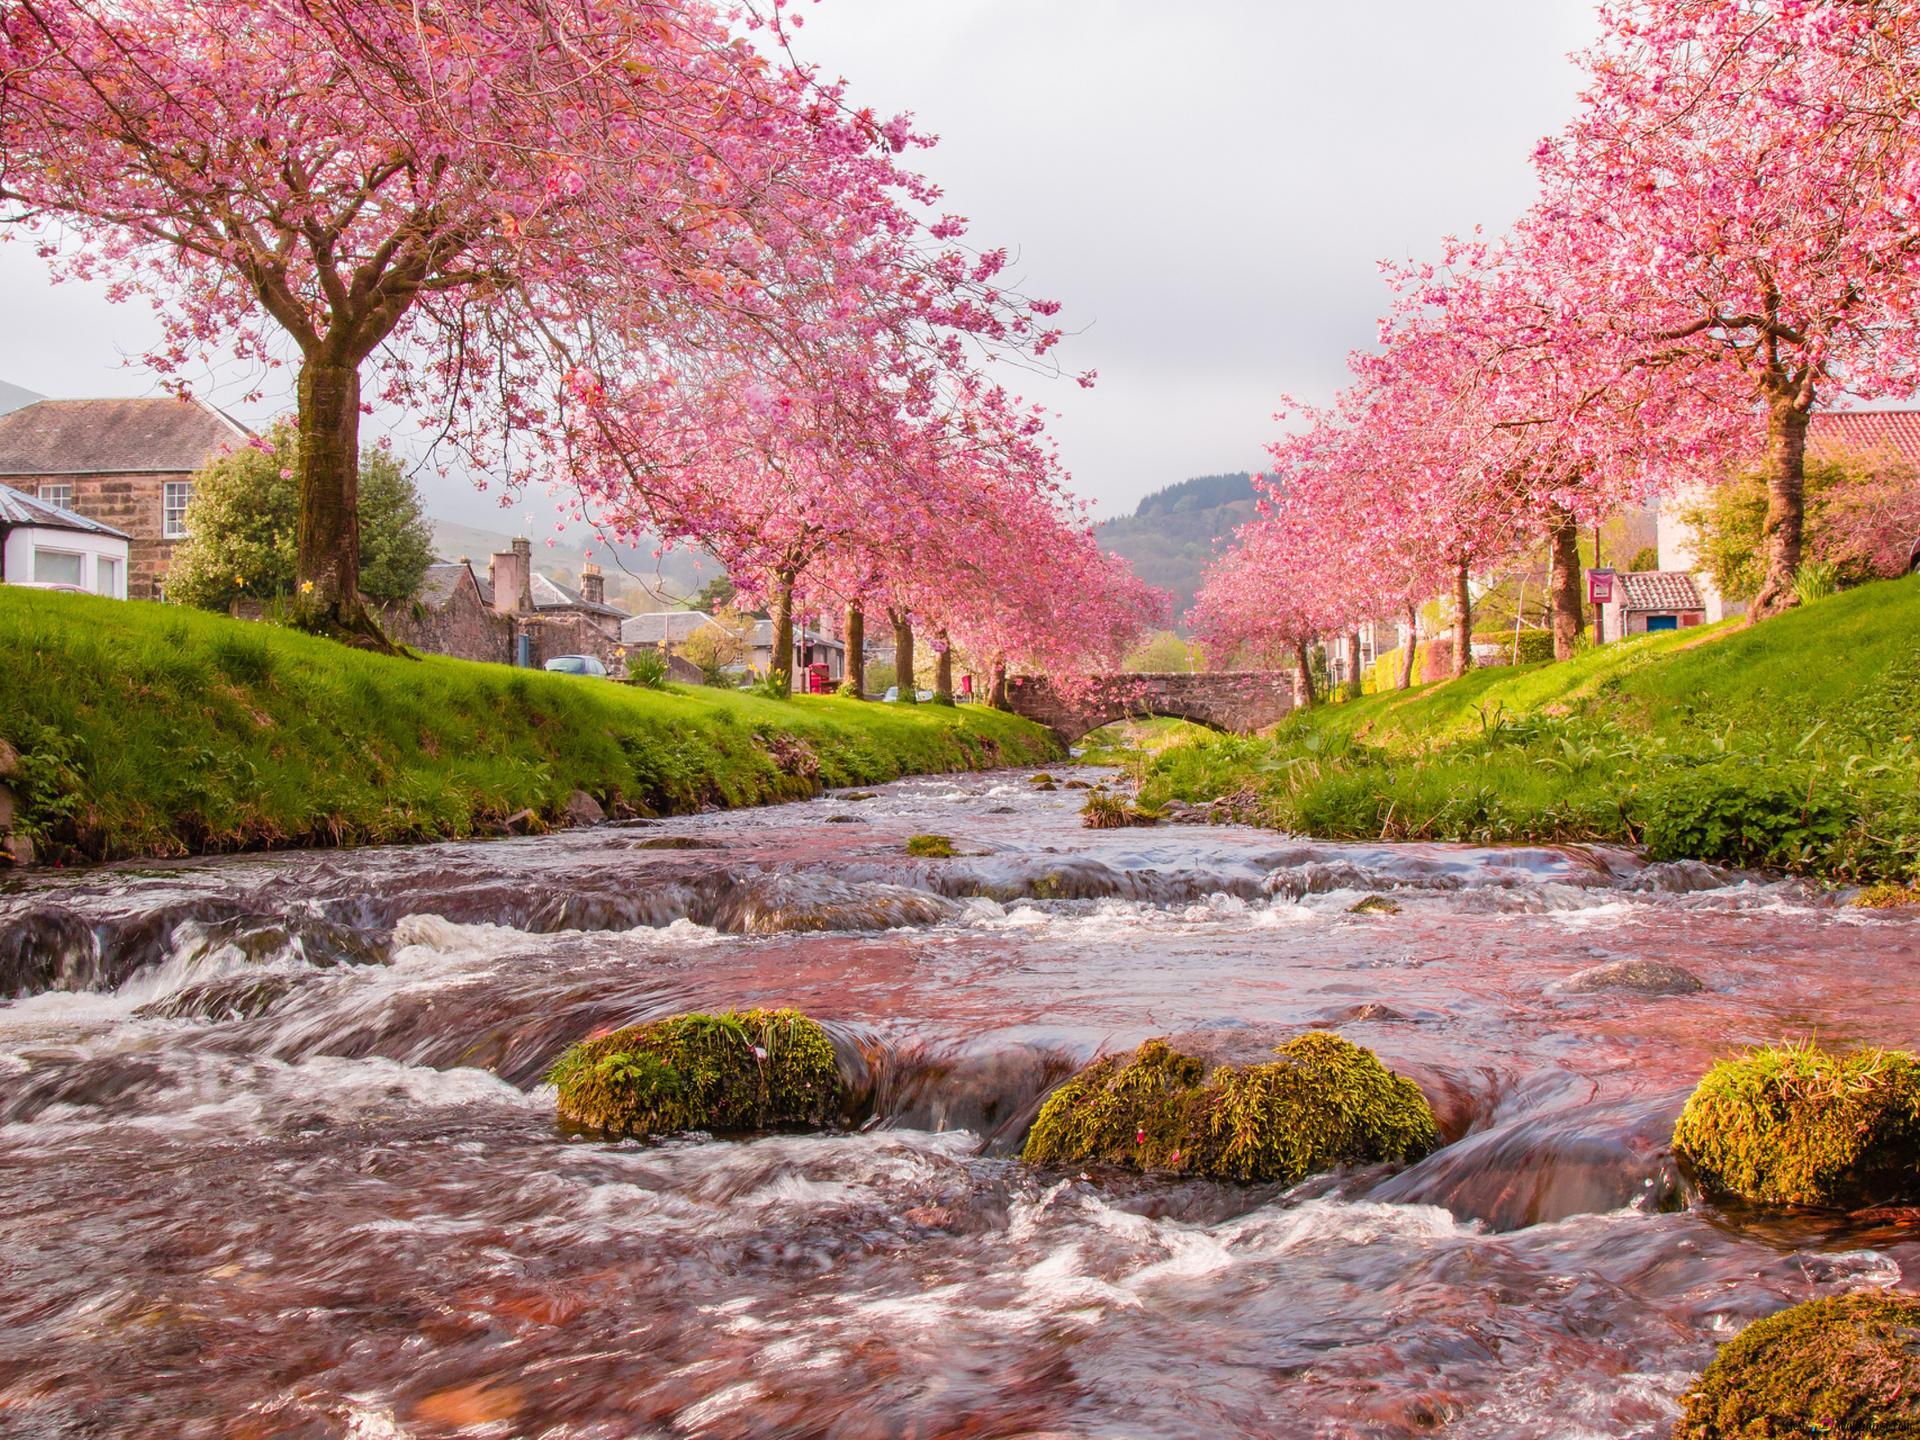 картинки на телефон природа весна река ушел армию, когда